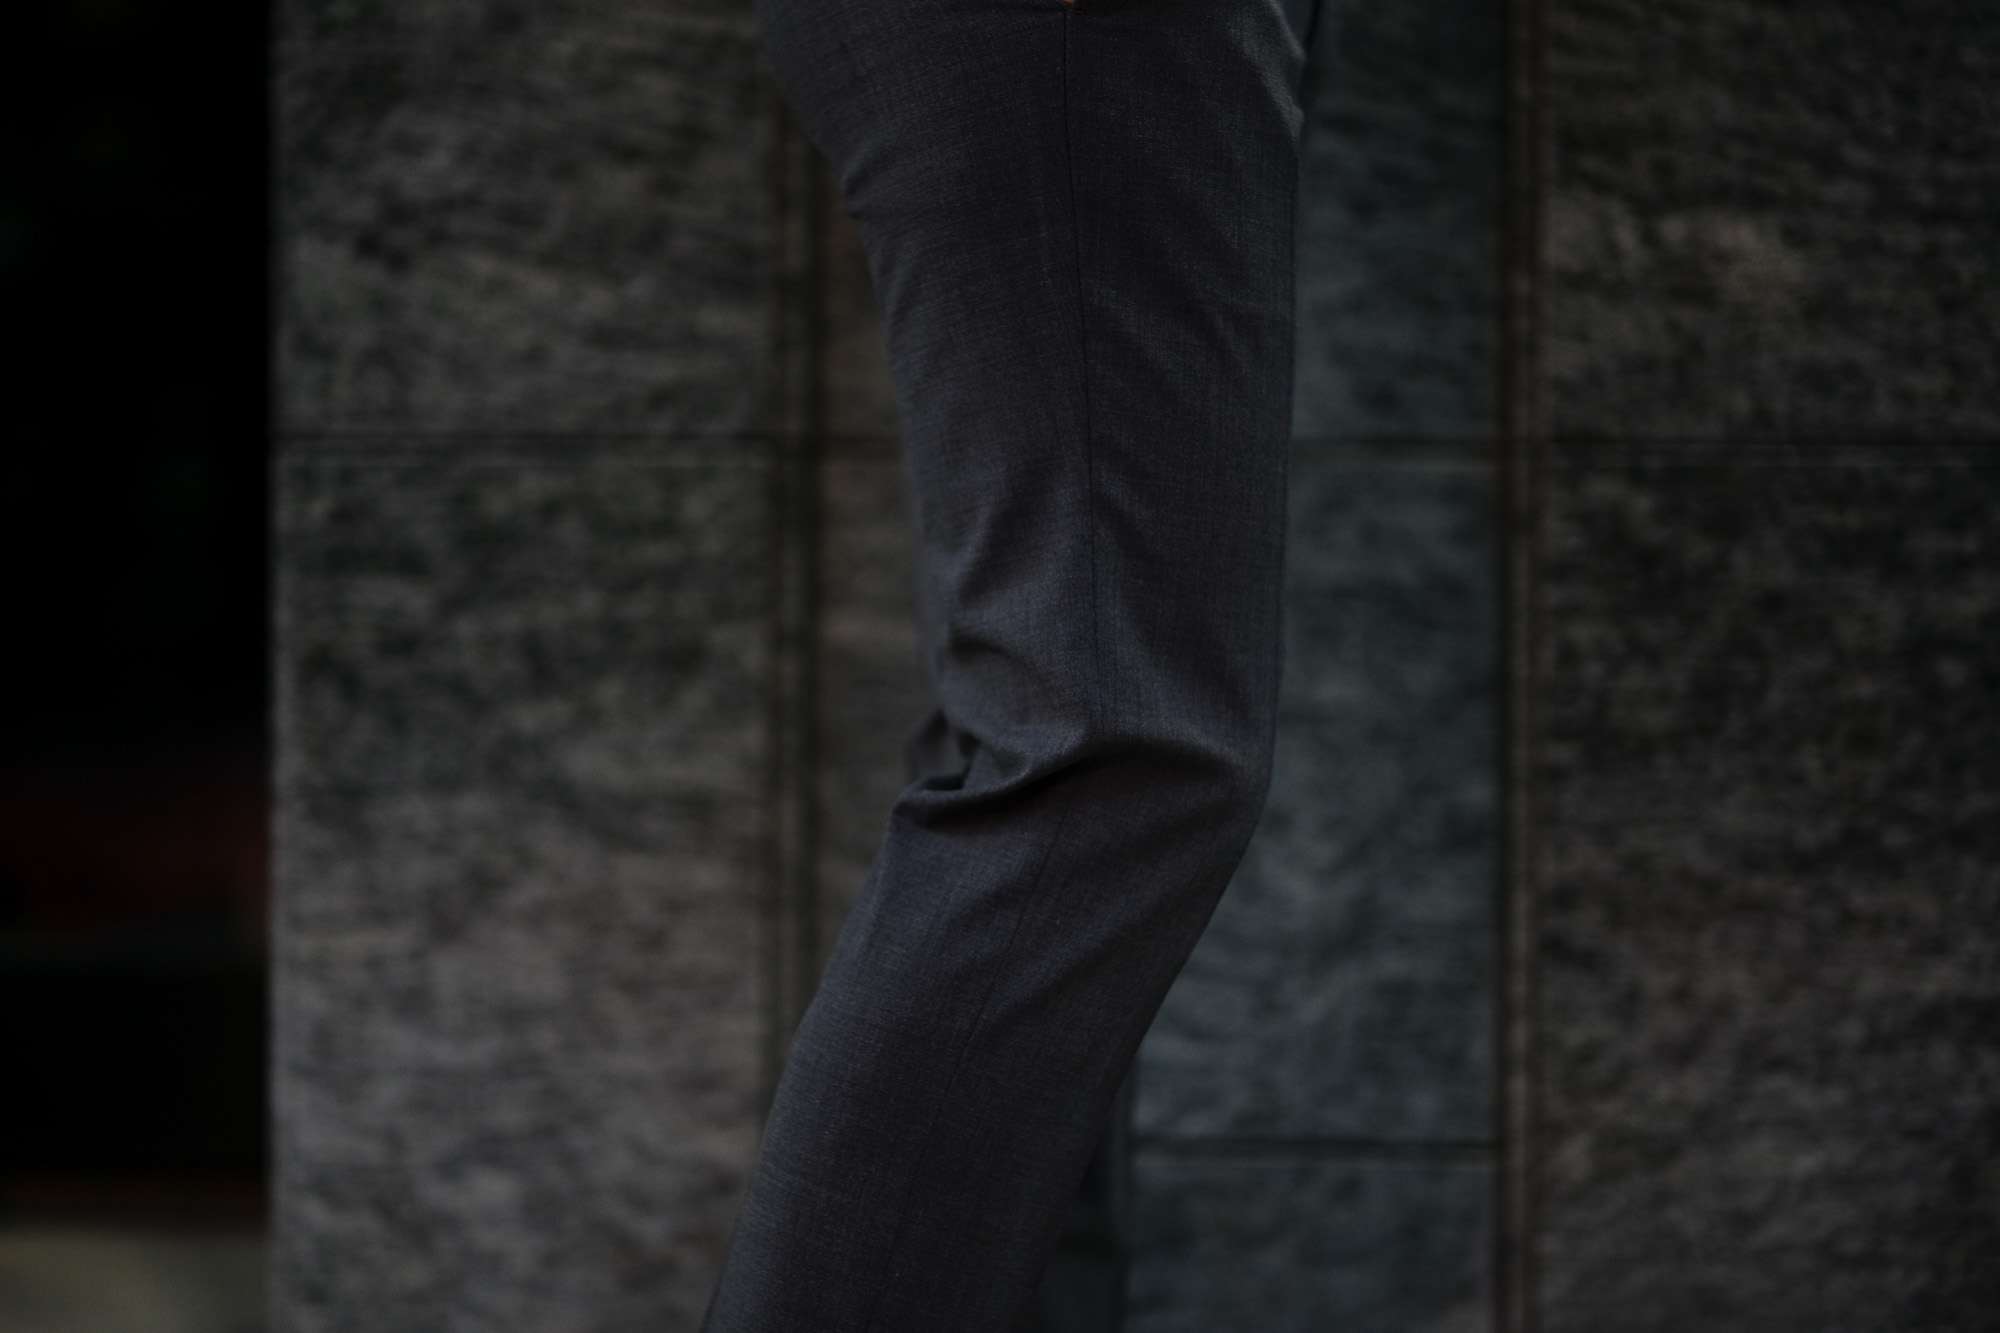 INCOTEX (インコテックス) N35 SLIM FIT (1NT035) URBAN TRAVELER (アーバントラベラー) TROPICAL TECHNOWOOL 撥水 ウォッシャブル トロピカル サマーウール スラックス CHARCOAL GRAY (チャコールグレー・920) 2020 春夏 【ご予約受付中】 愛知 名古屋 altoediritto アルトエデリット